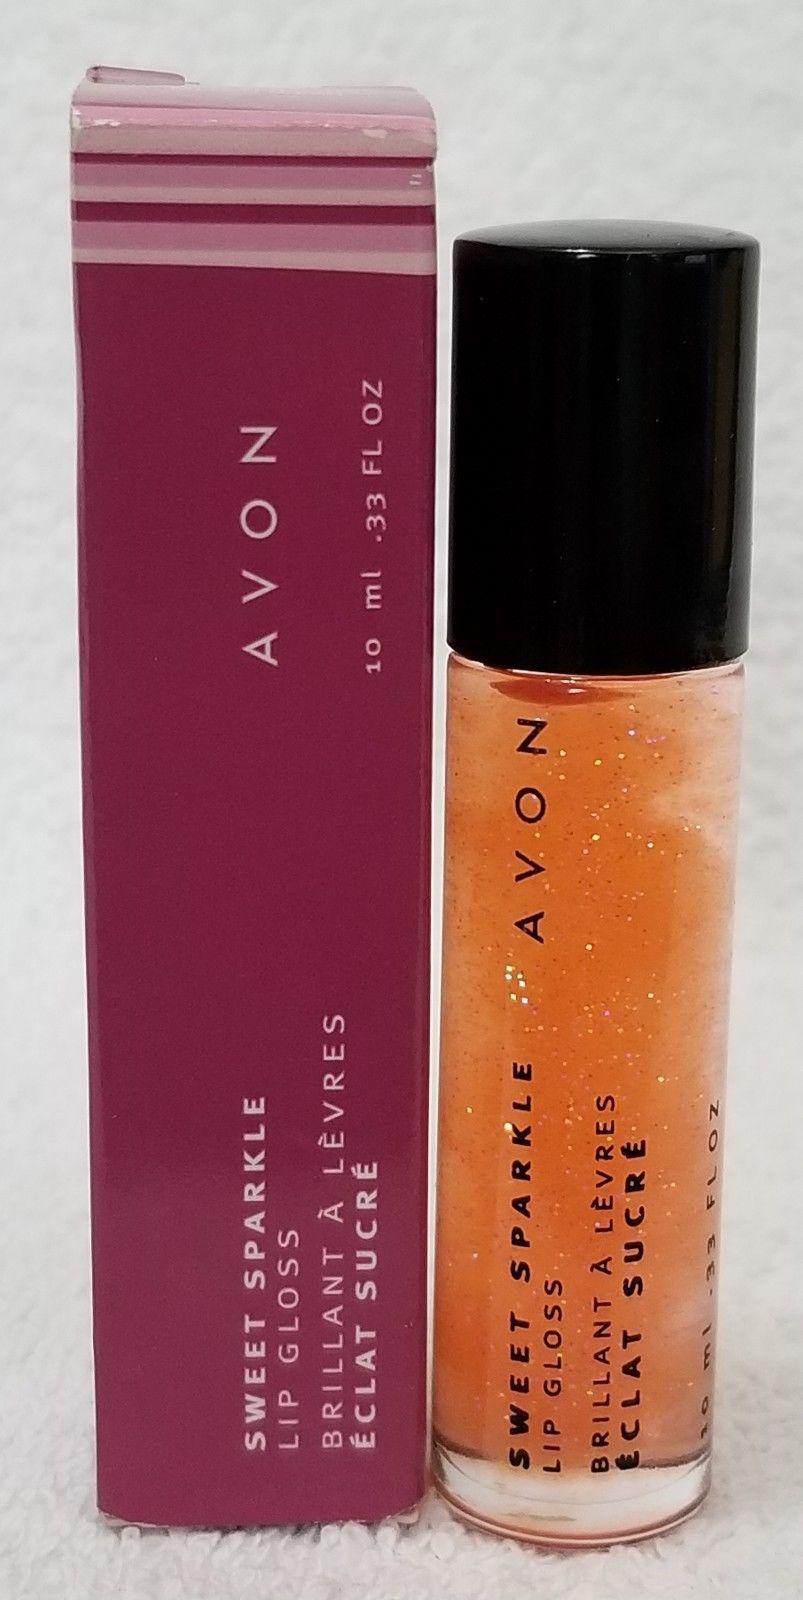 Avon Sweet Sparkle WATERMELON Lip Gloss Sheer Shimmer Rollerball .33 oz/10mL New